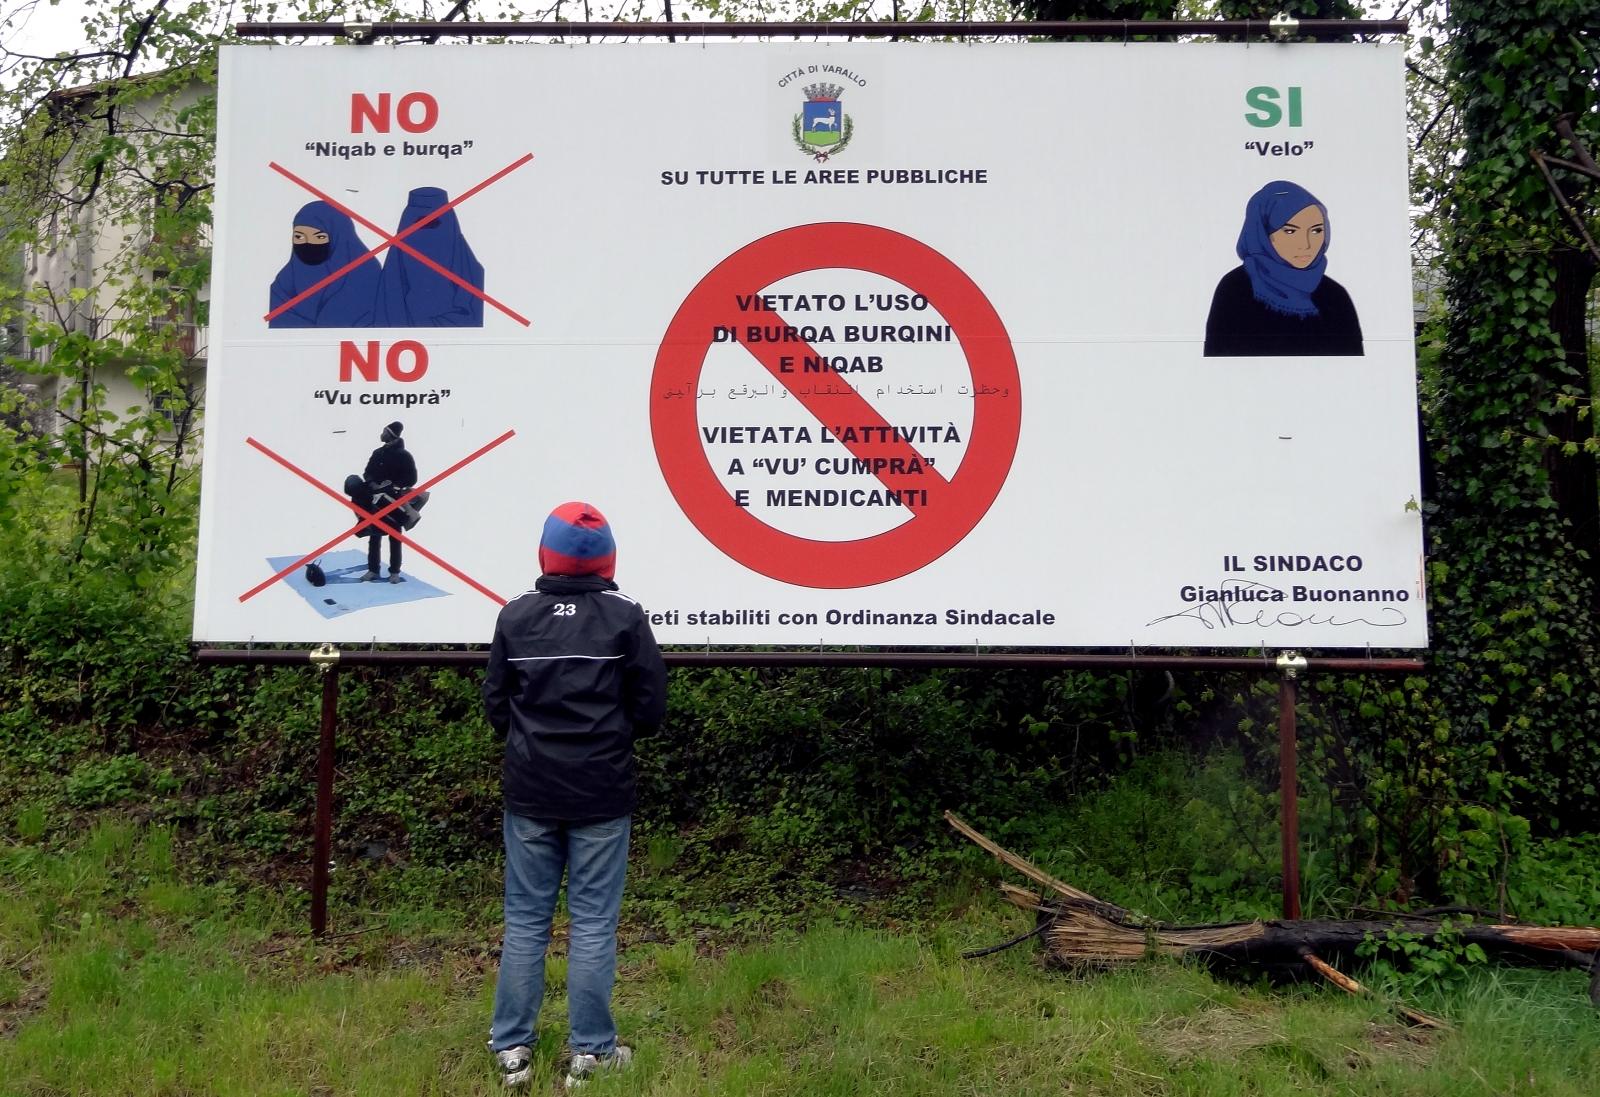 islam muslim clothing bans europe